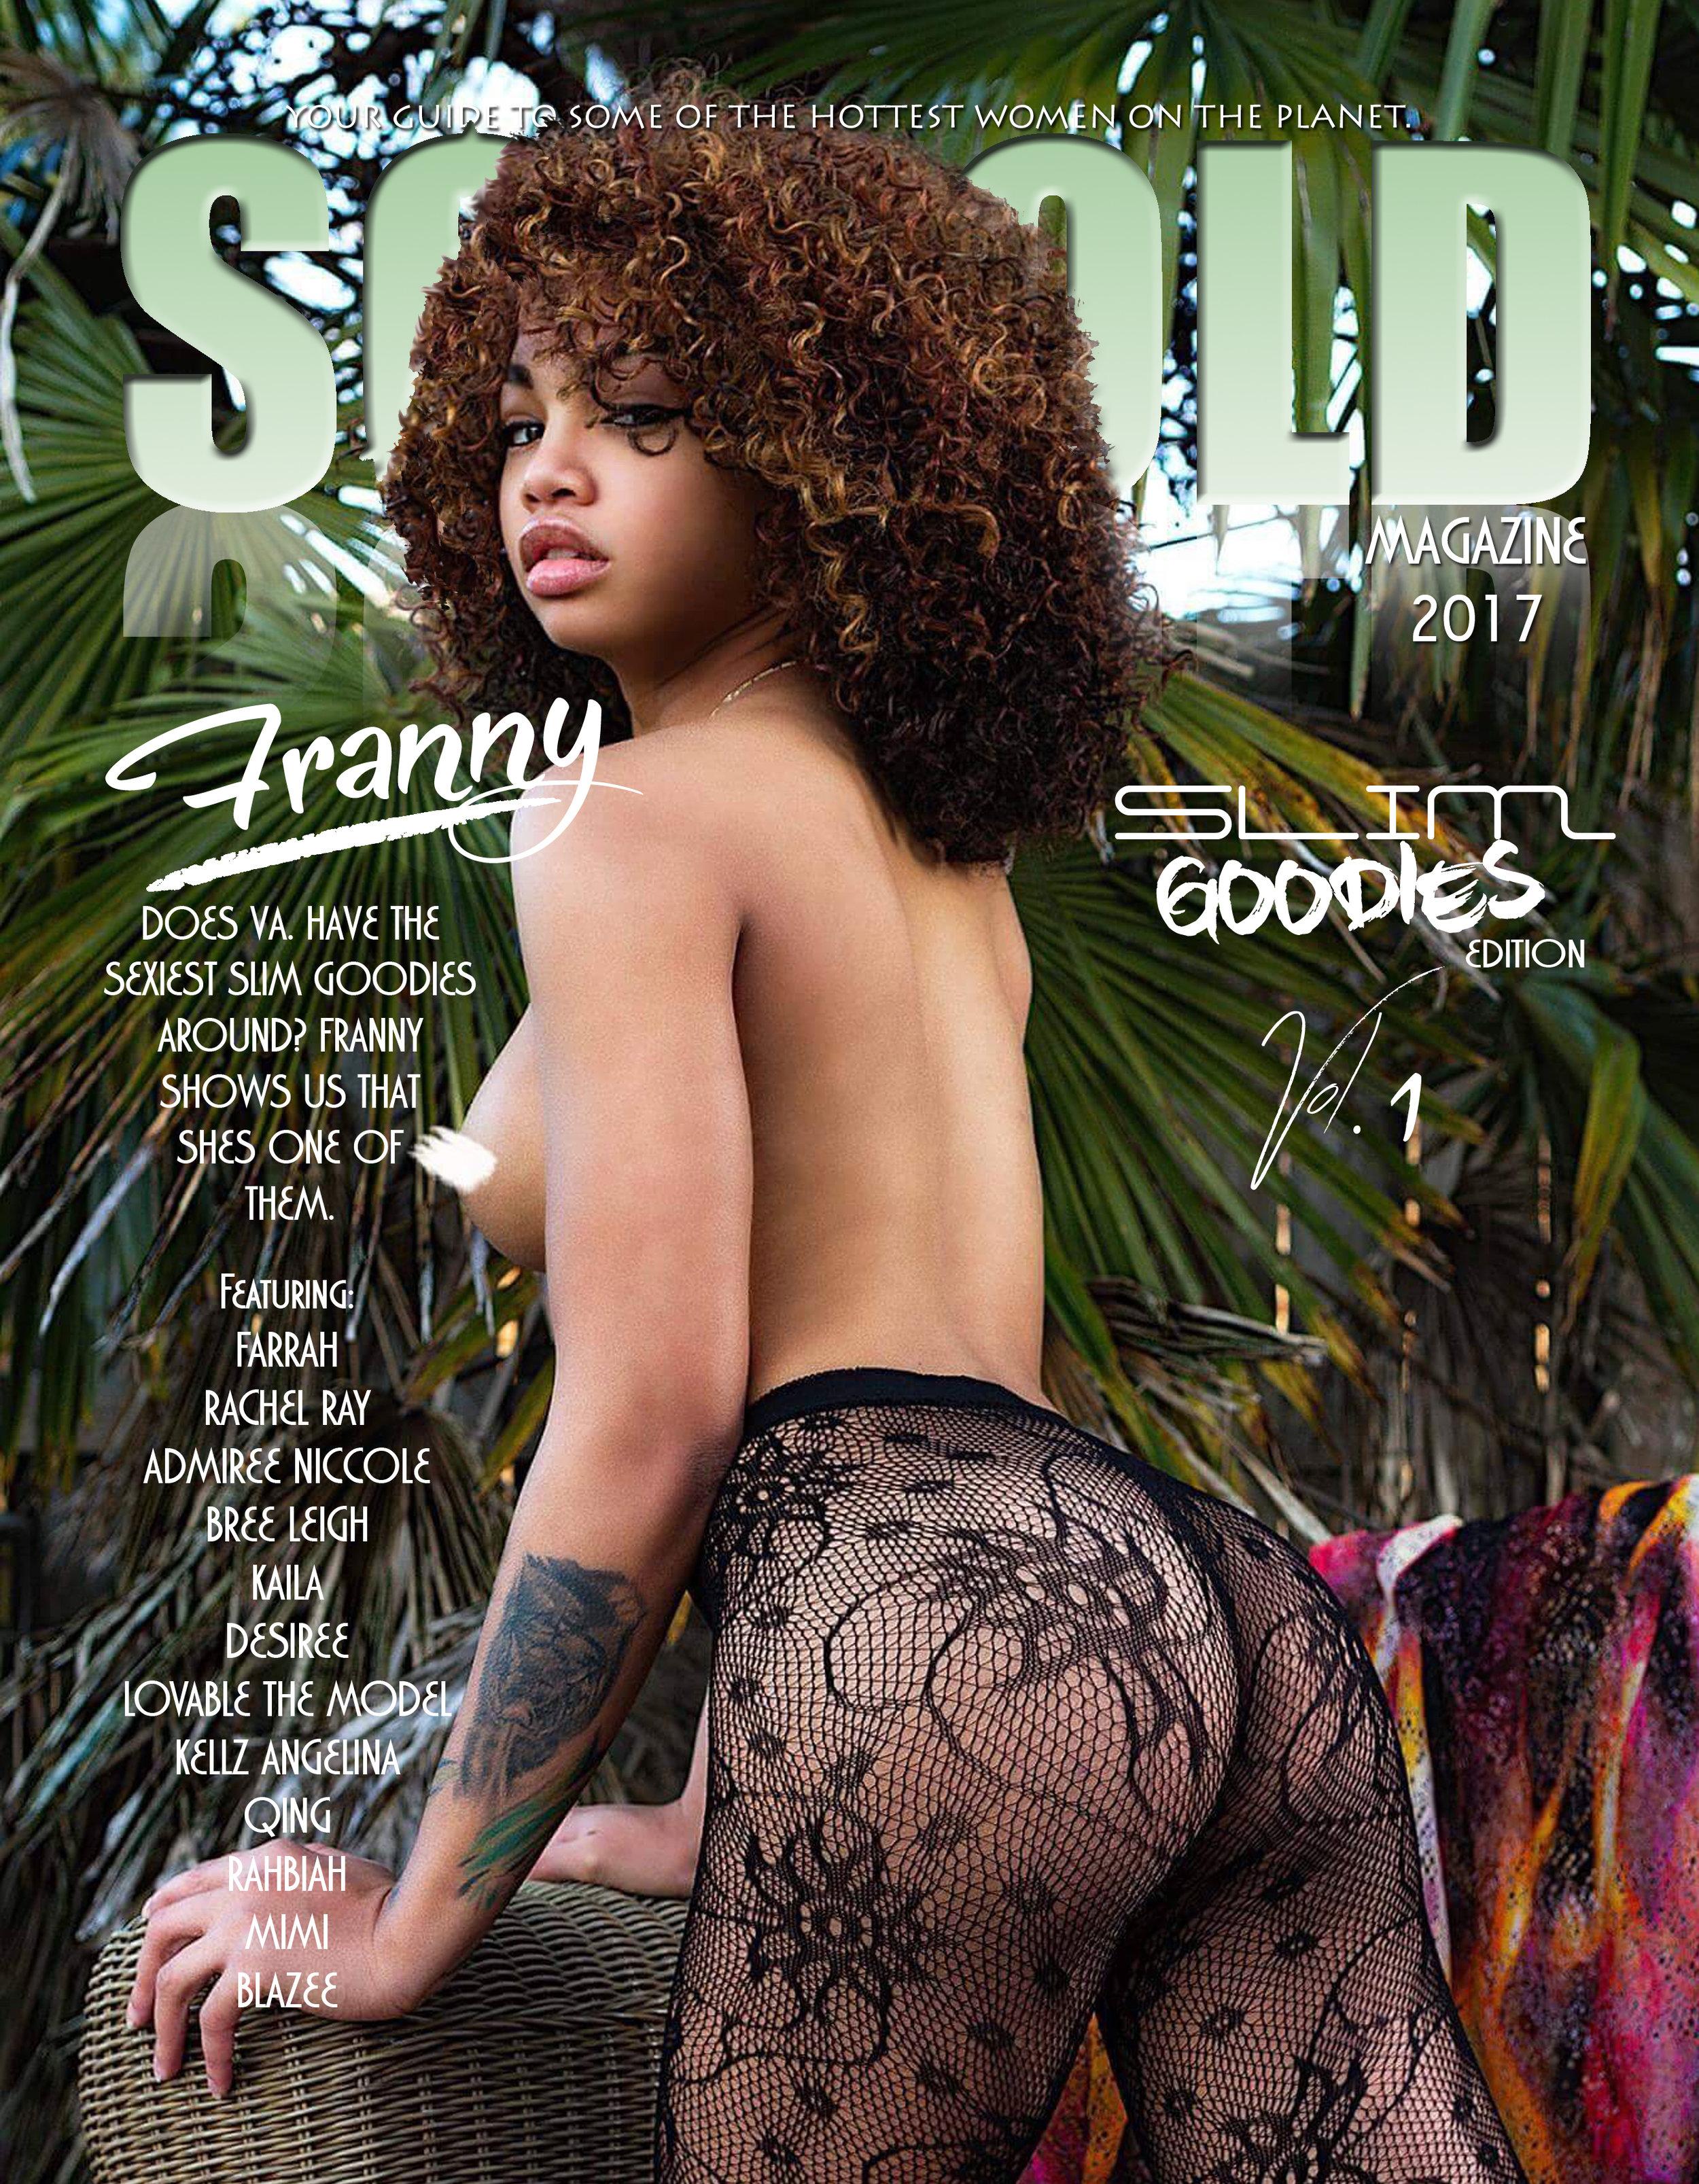 Franny cover 4 of 4 copy.jpg